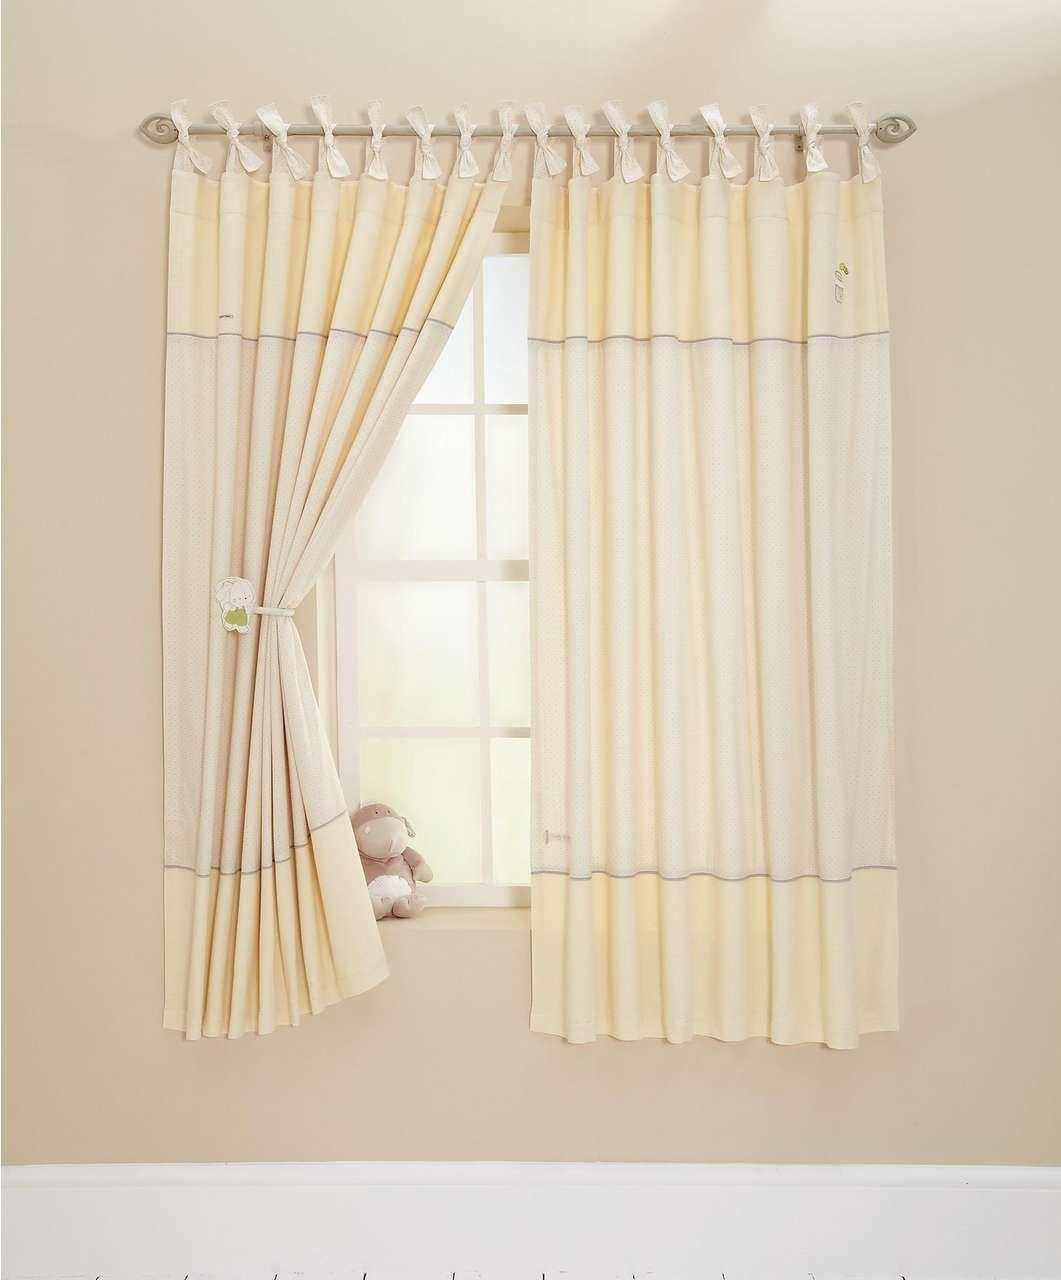 Curtains (132 X 160cm)